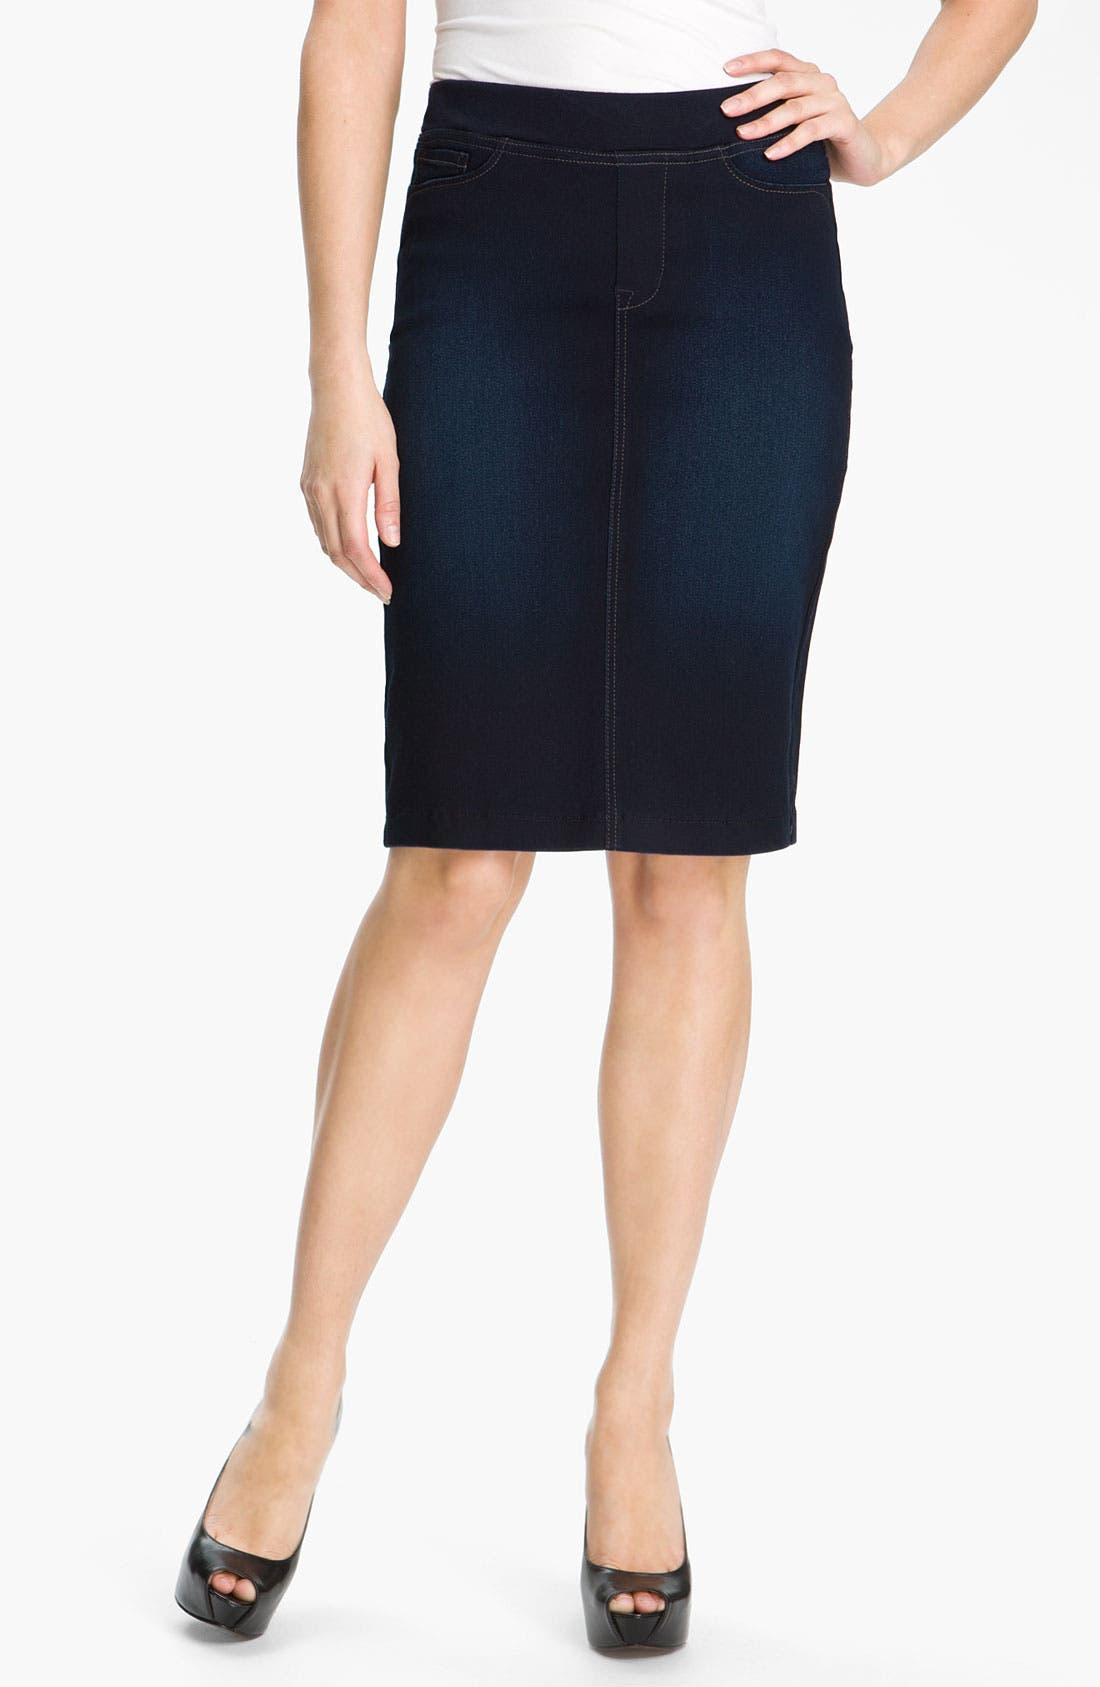 Alternate Image 1 Selected - NYDJ 'Caitlyn' Pull-On Denim Skirt (Petite)